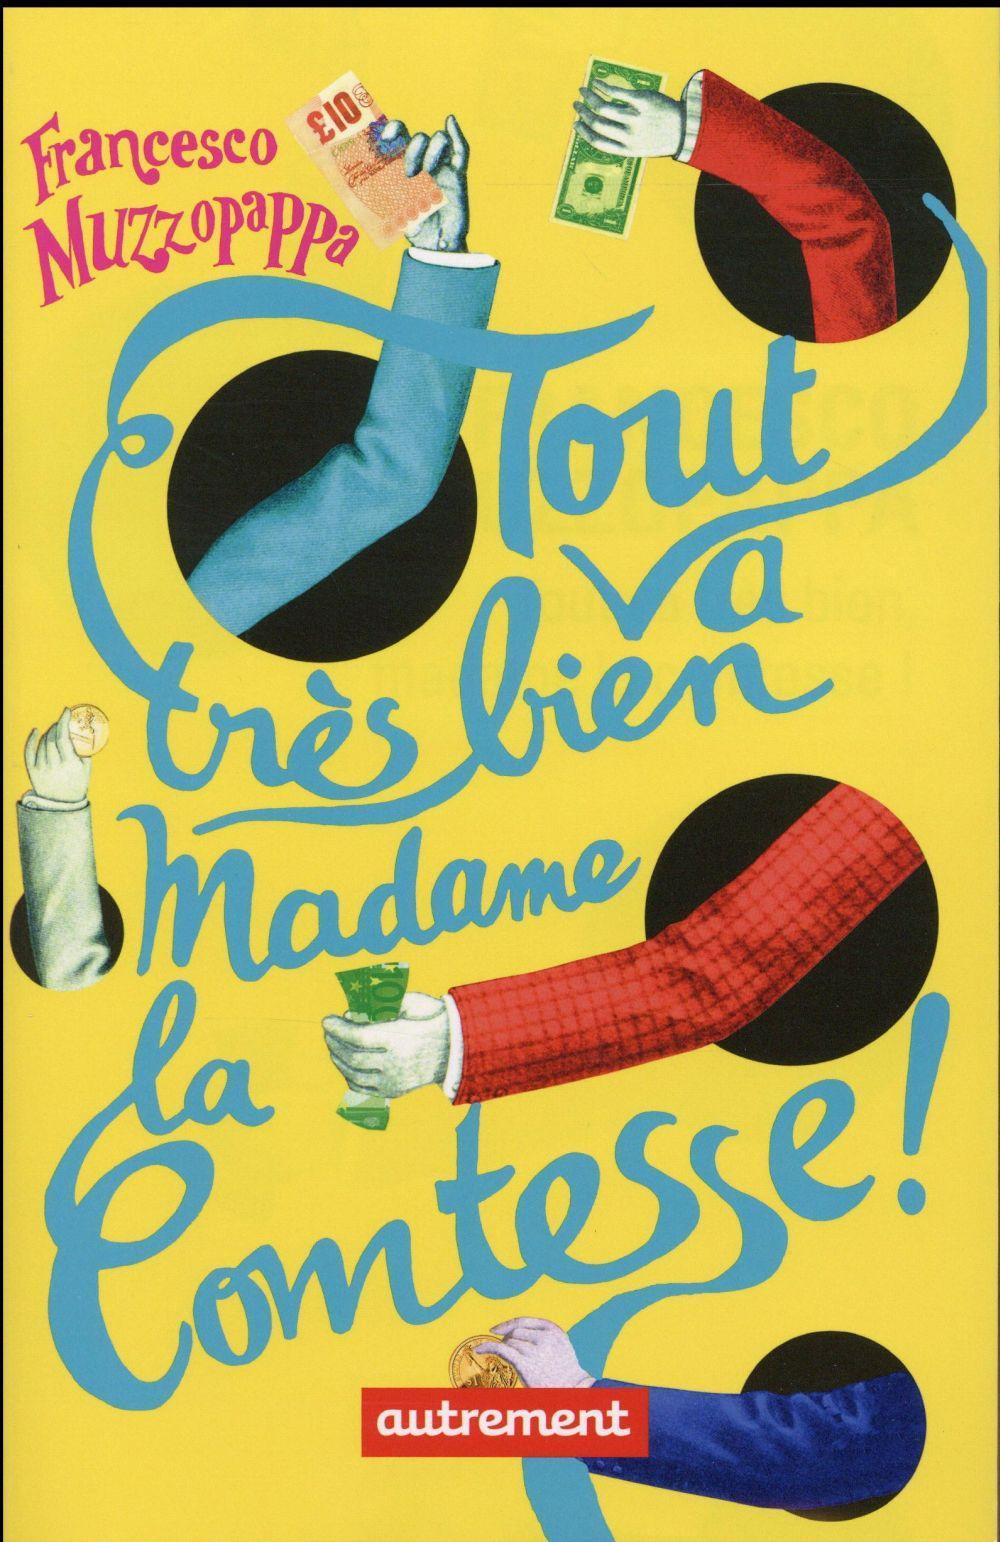 Tout va tr s bien madame la comtesse francesco muzzopappa livre france loisirs - Madame tout va bien ...